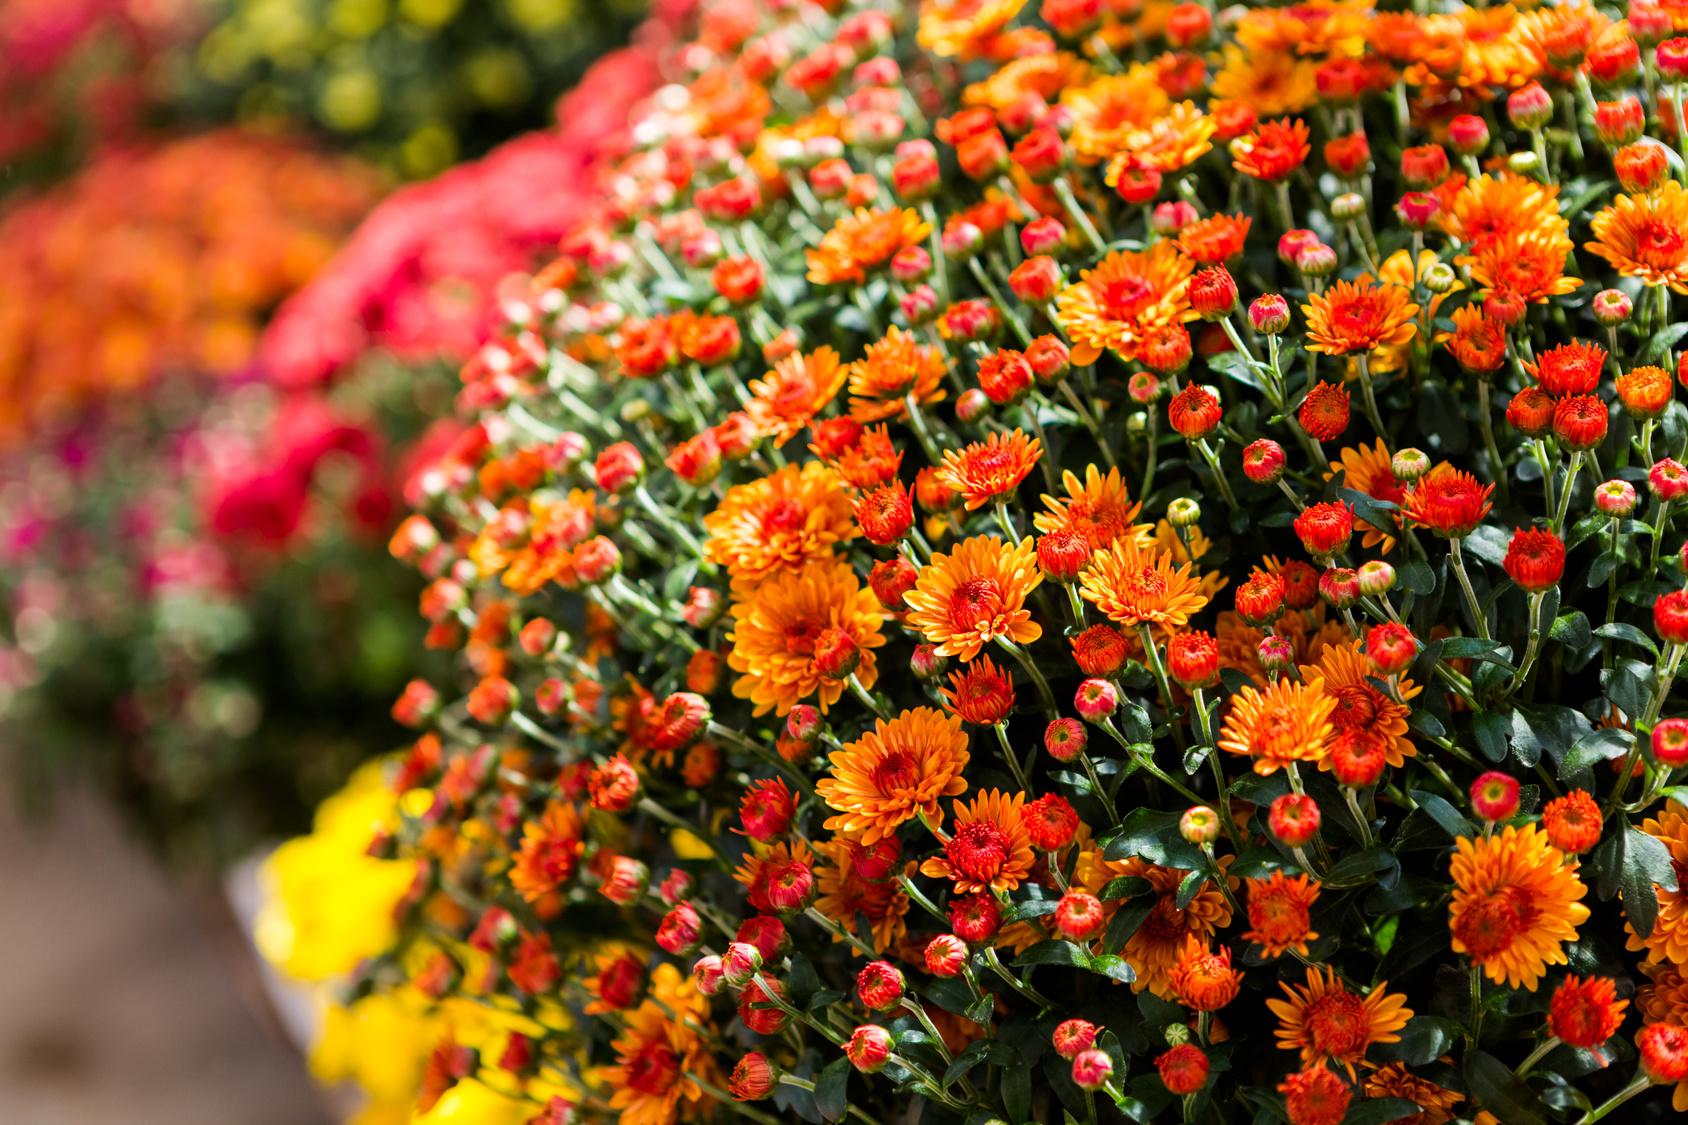 como cultivar crisântemo : como plantar crisântemos jardim